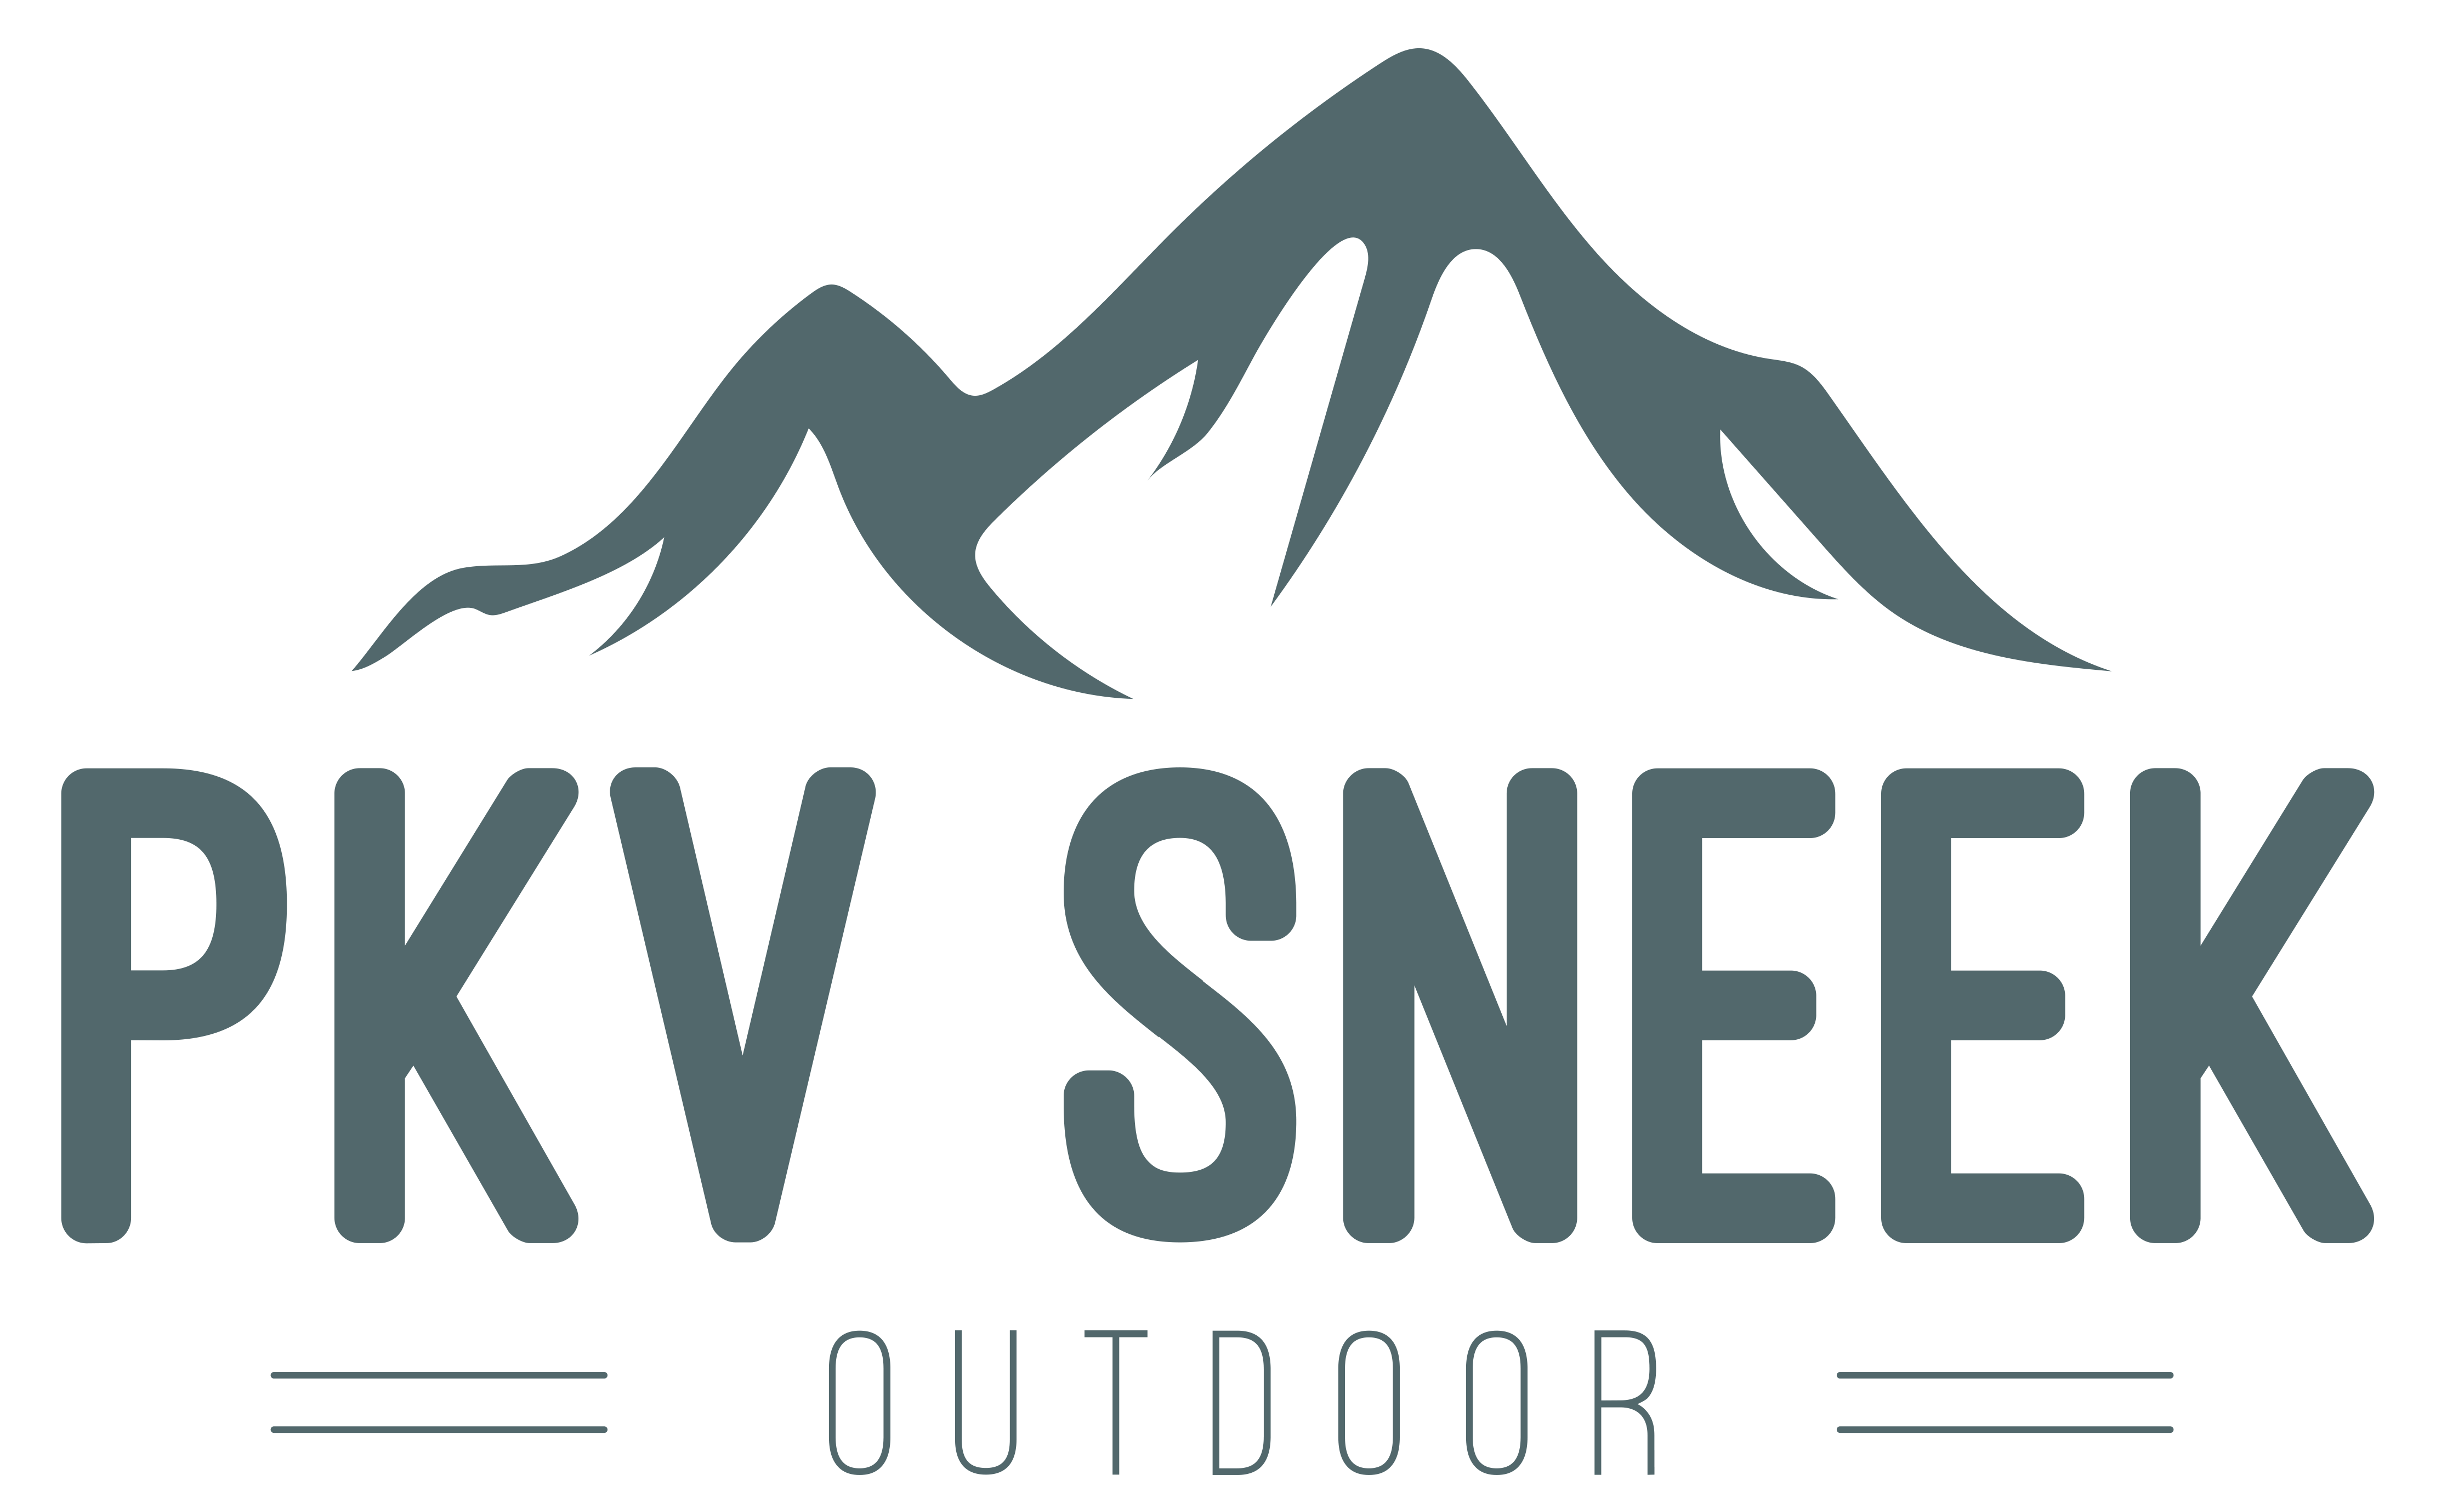 PKV Sneek